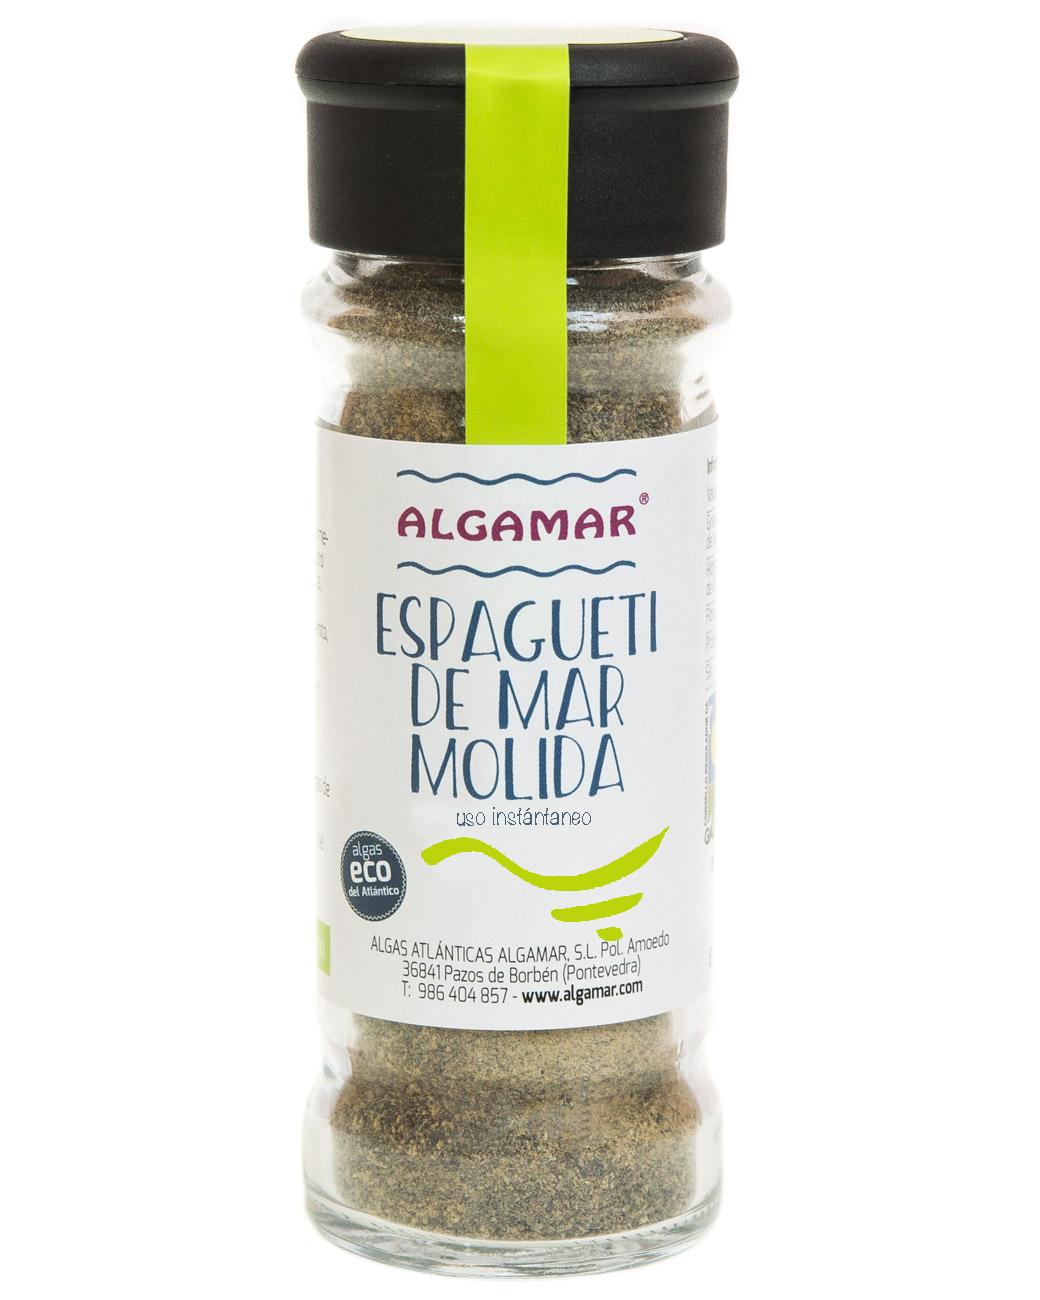 espagueti-de-mar-molida-70g